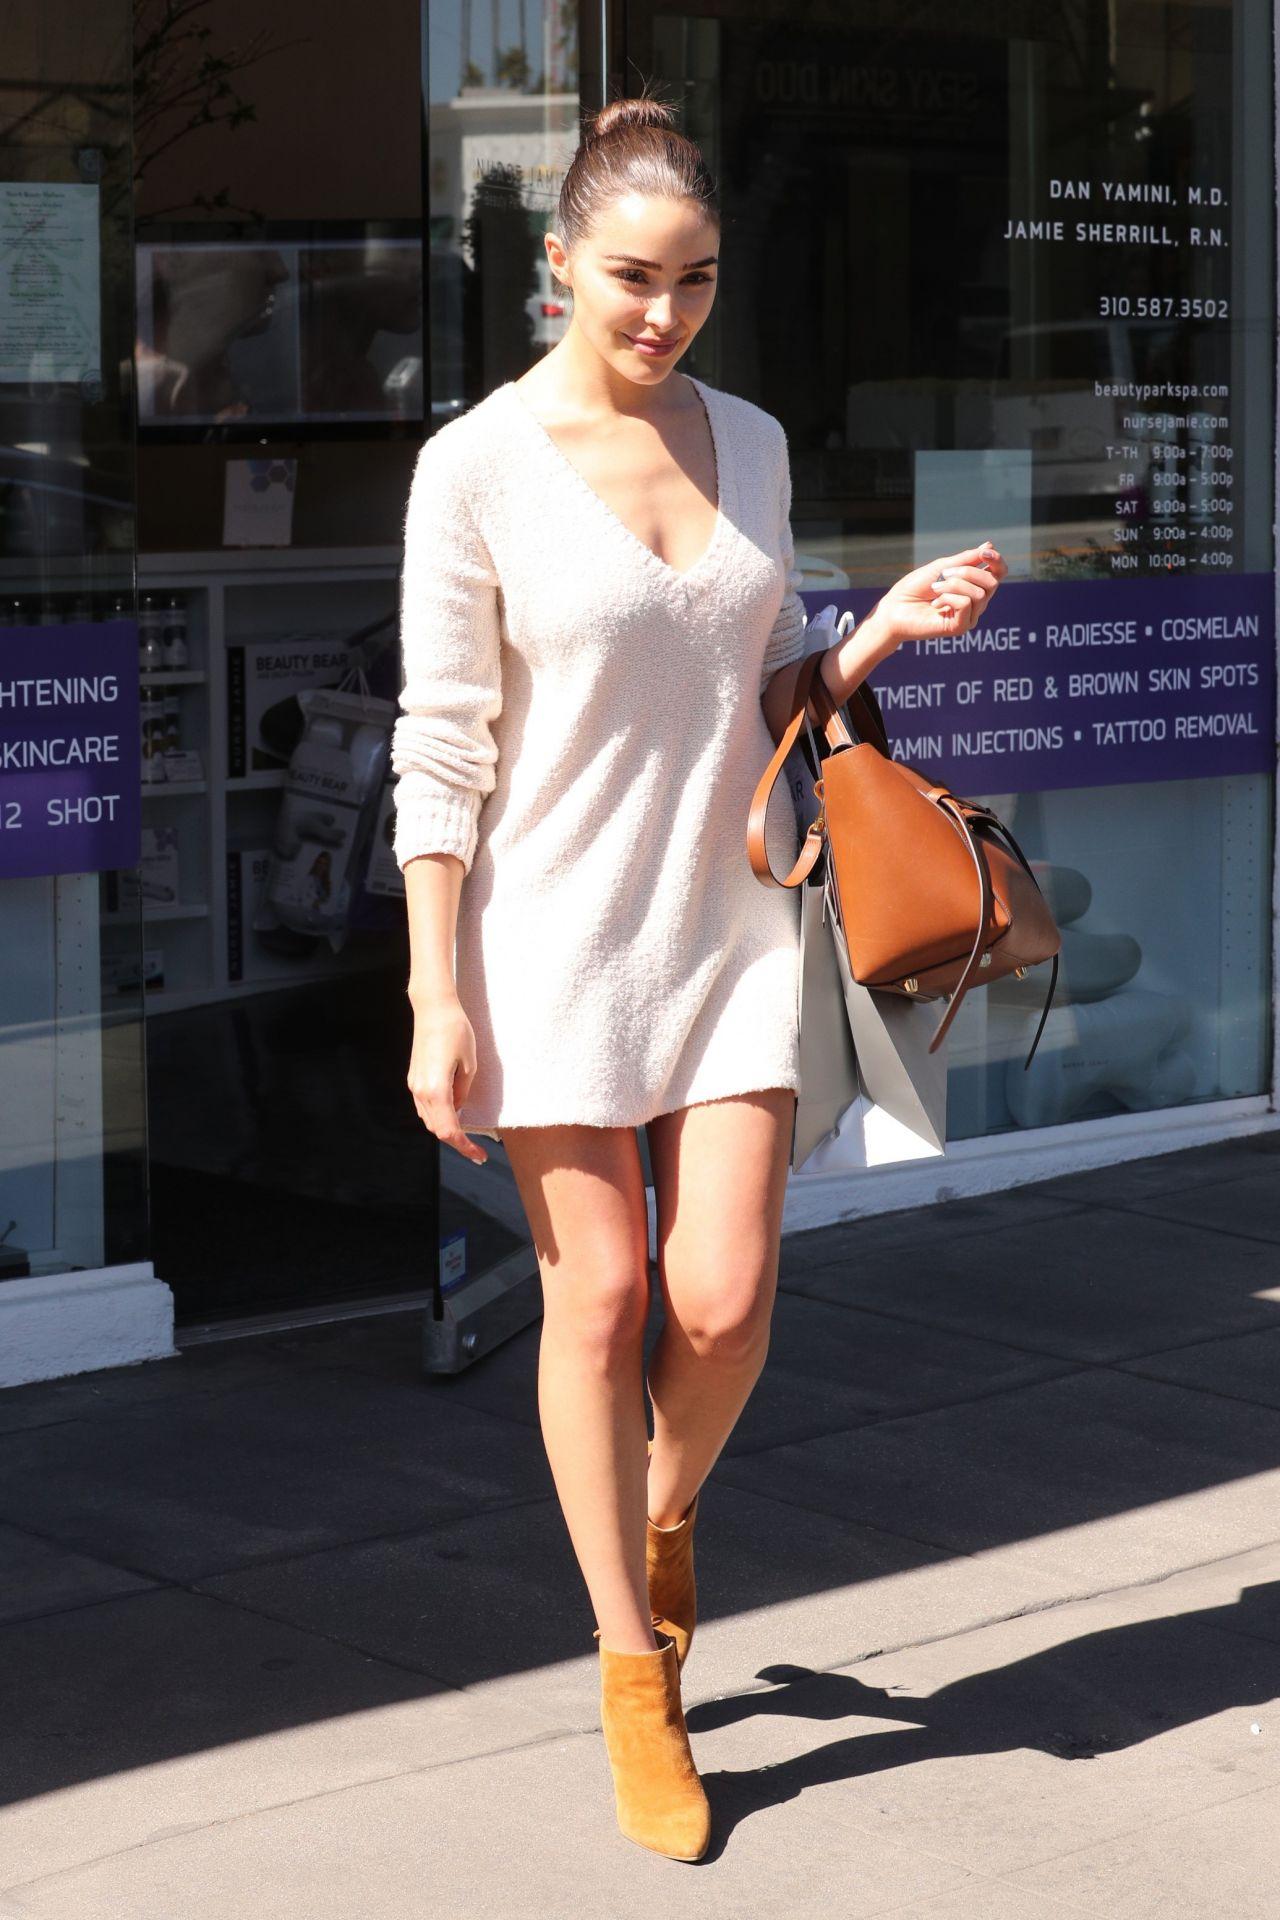 Olivia culpo shows off her legs leaving nurse jaime beauty salon in santa monica